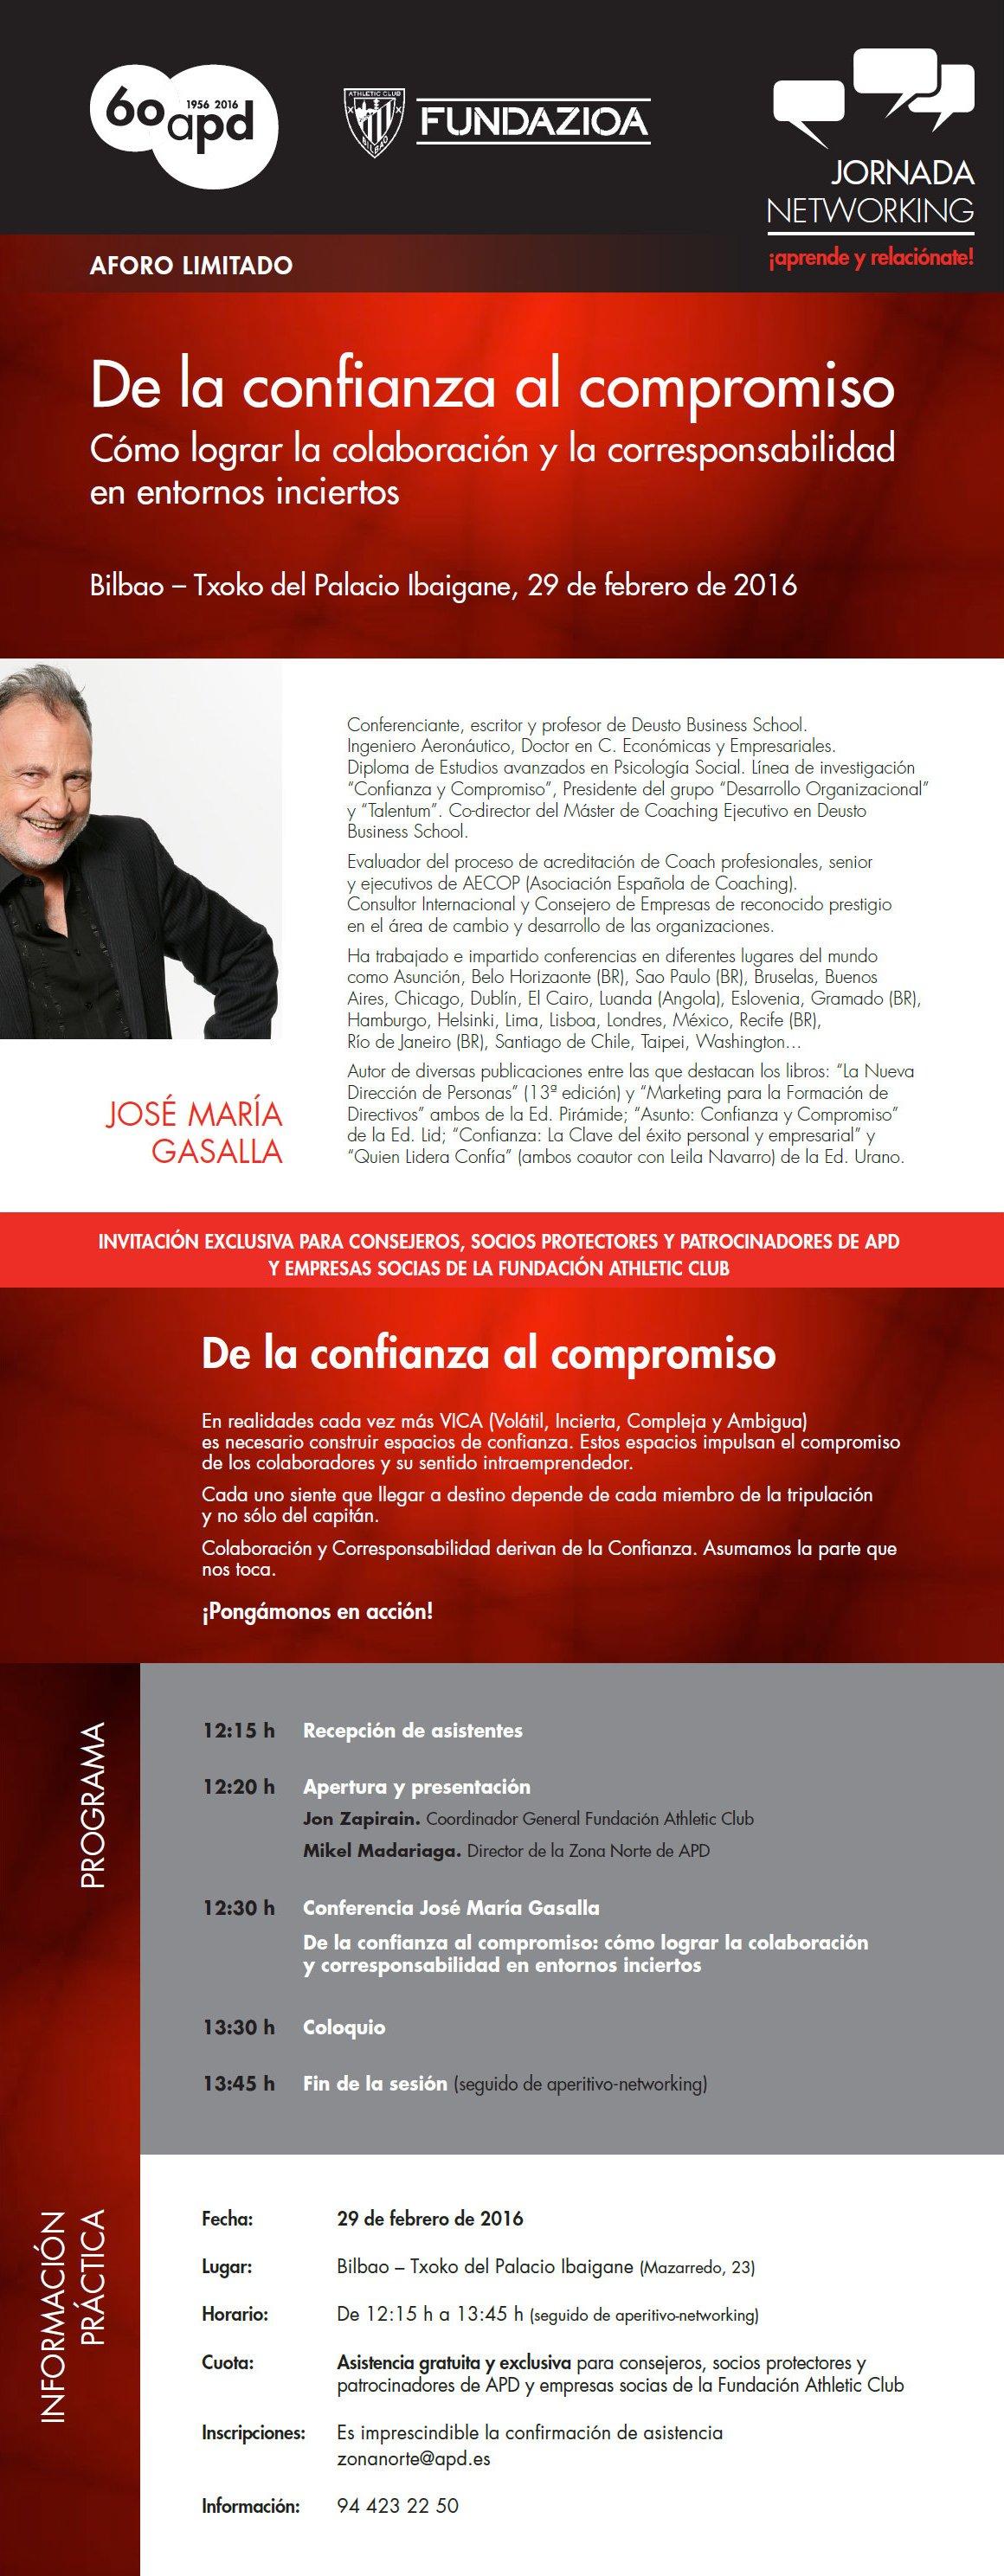 2016-02-29-Bilbao-CONFIANZA-COMPROMISO